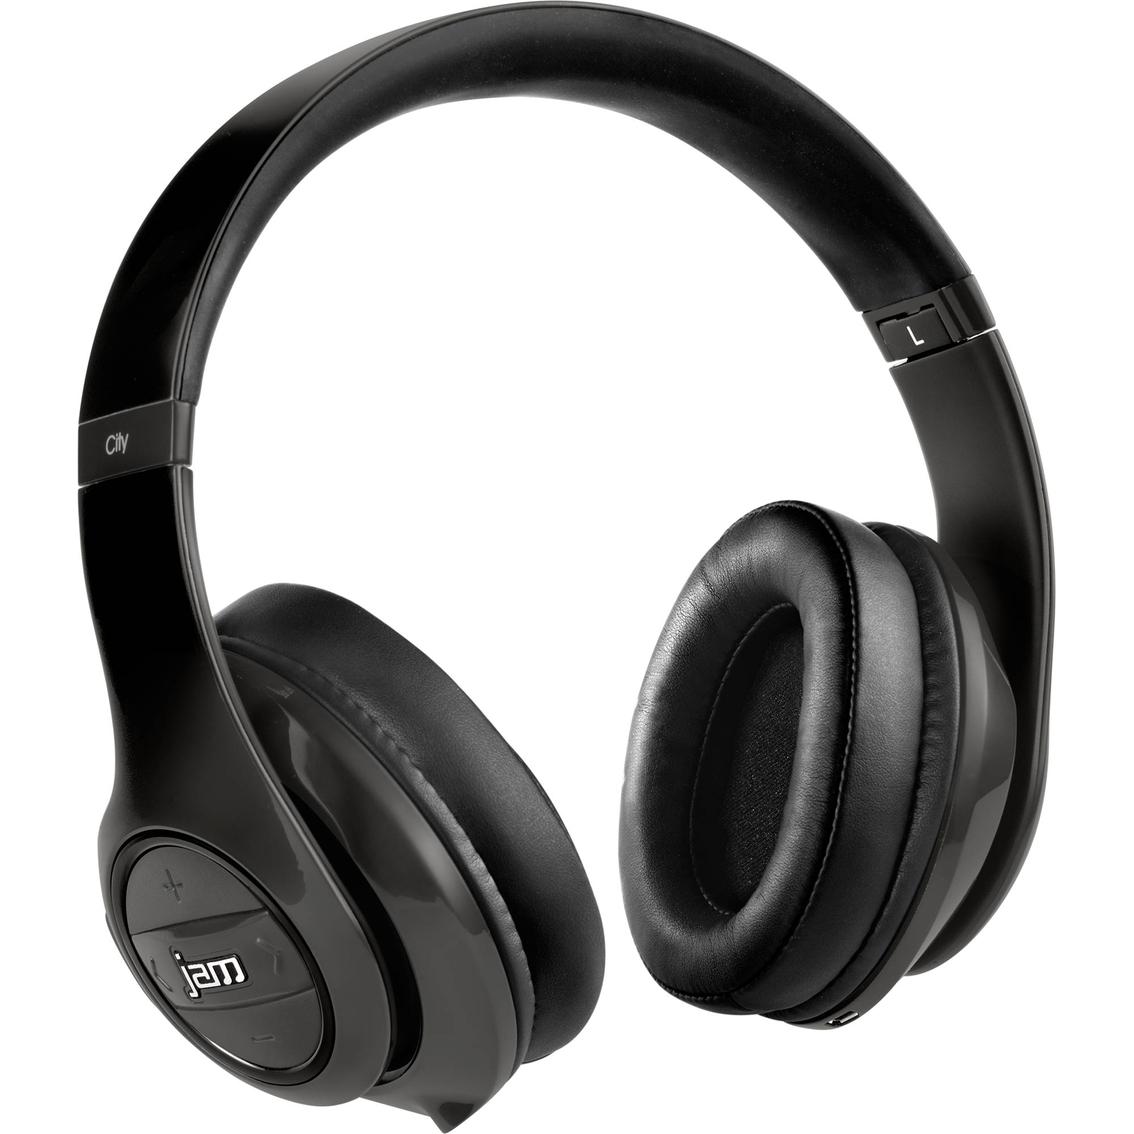 Headphones earbuds bluetooth wireless - jam ultra wireless bluetooth earbuds